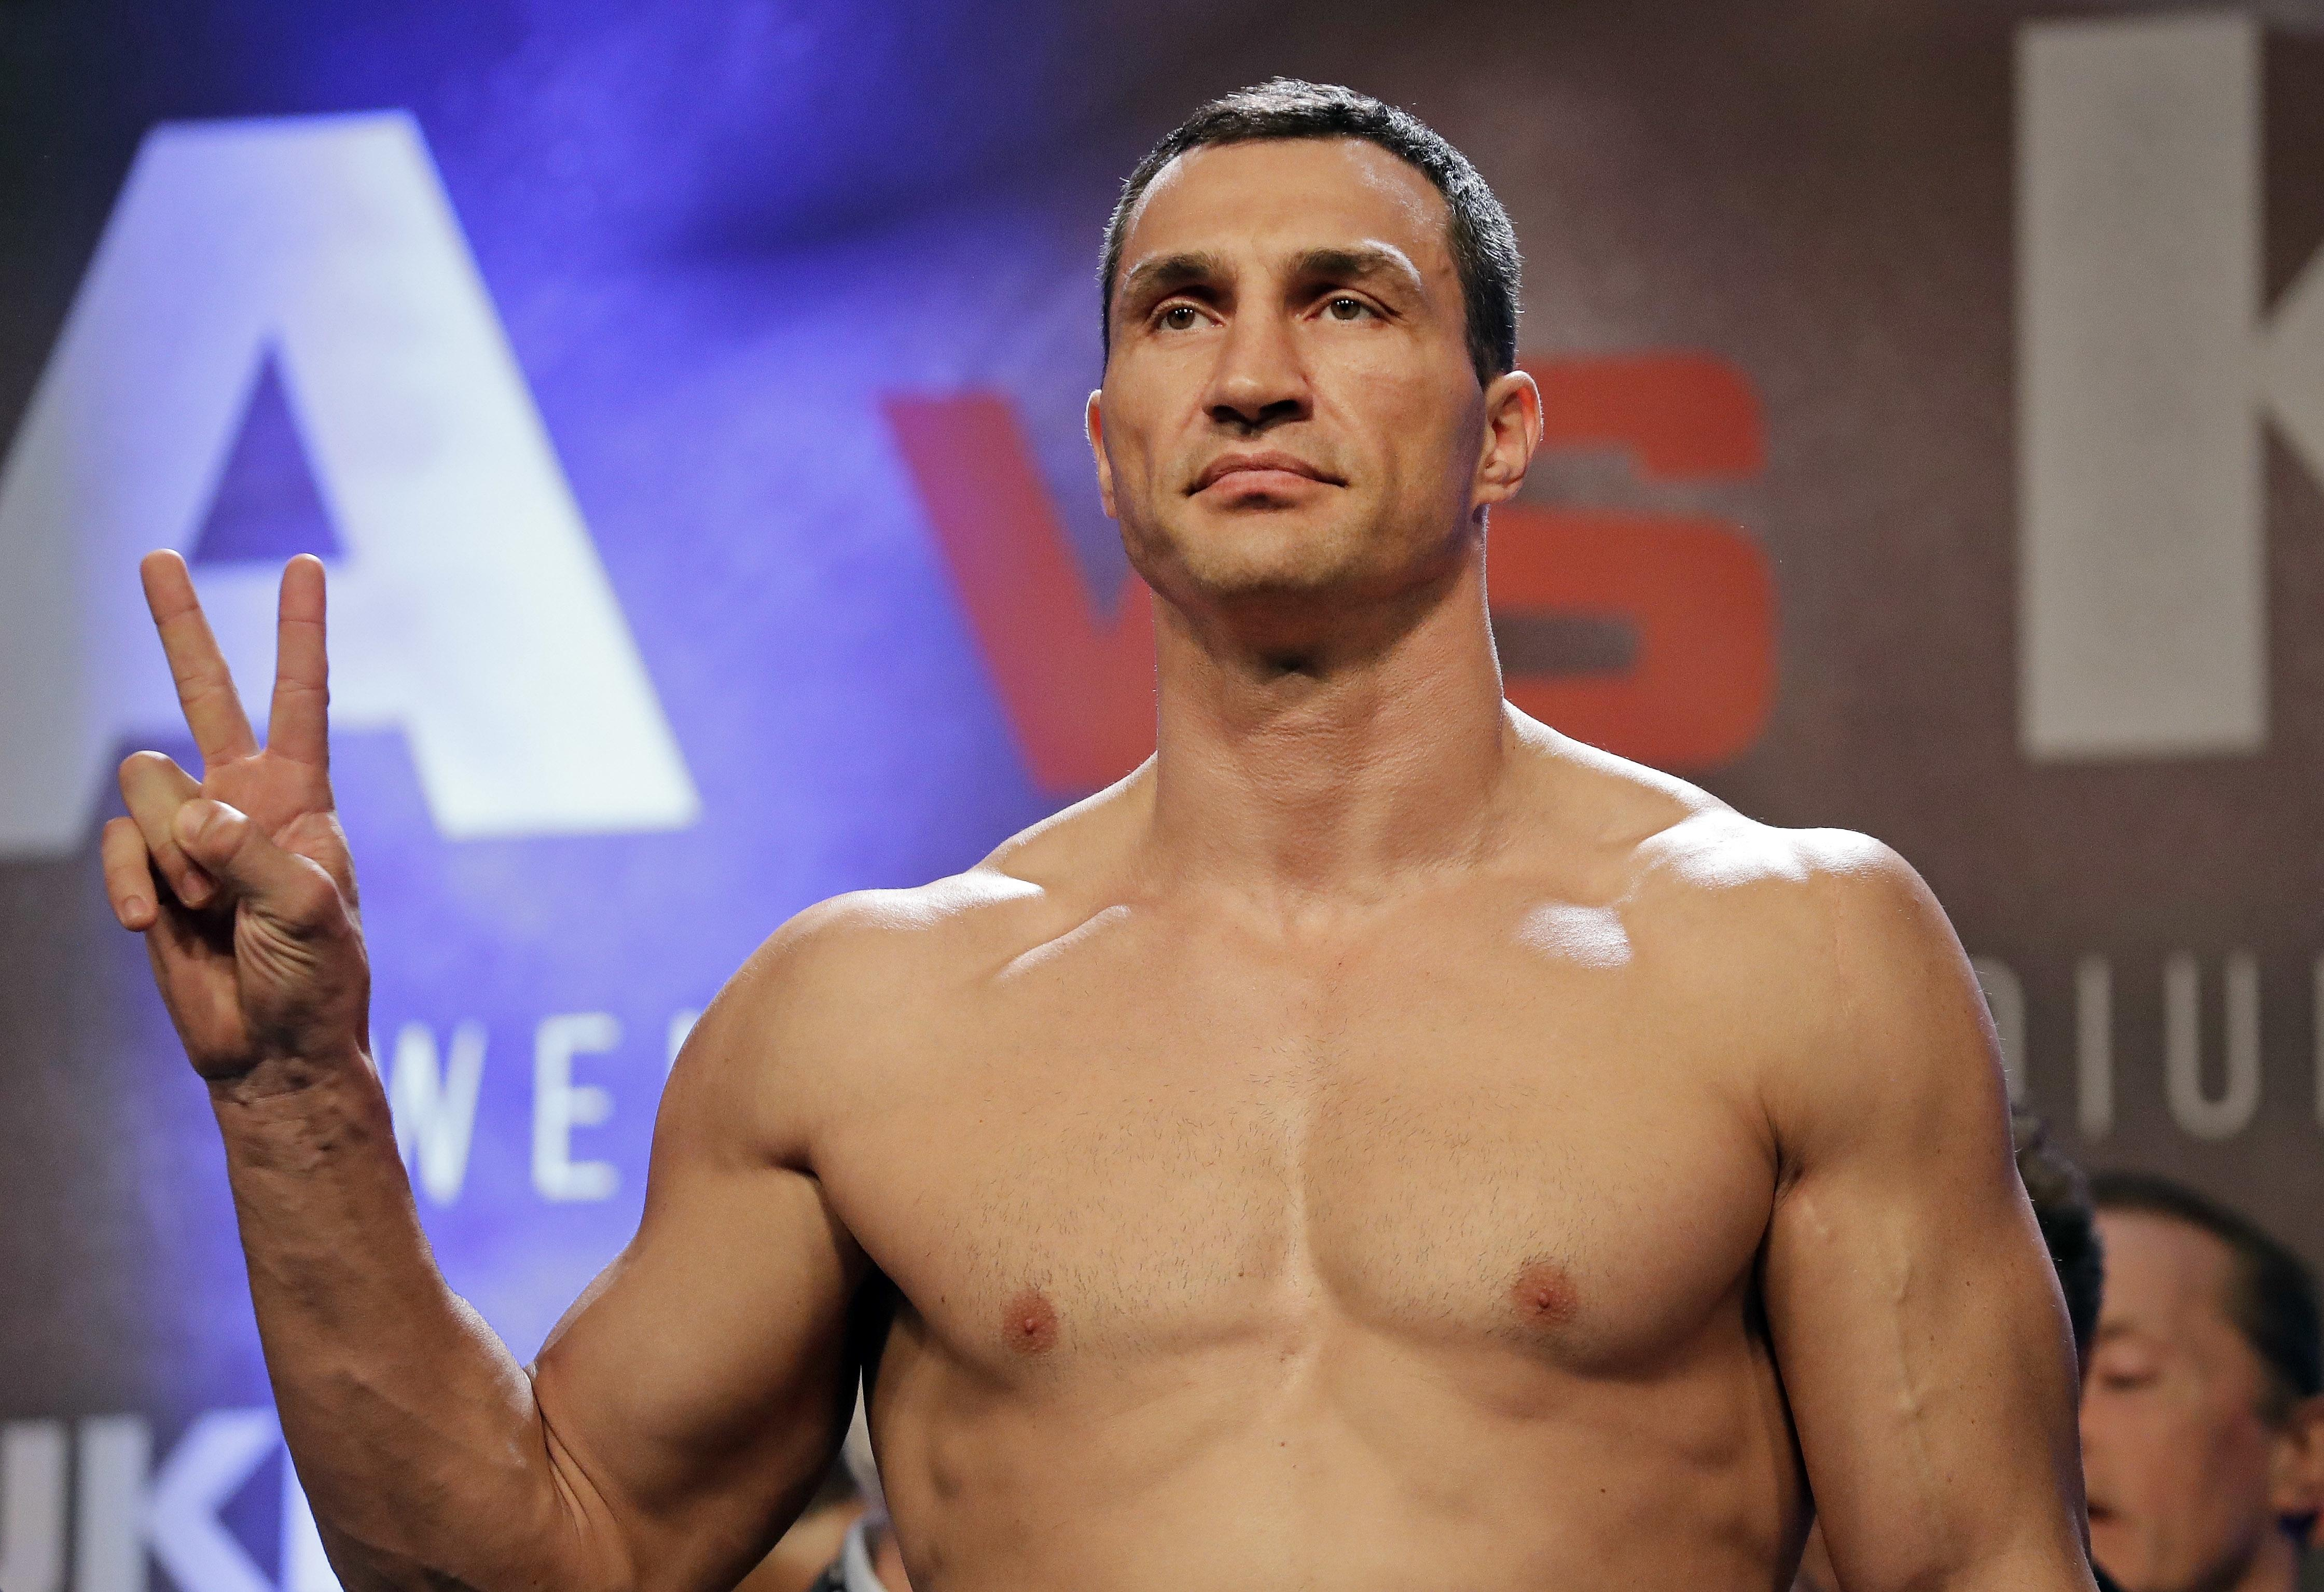 The Ukrainian is convinced Anthony Joshua will beat Tyson Fury